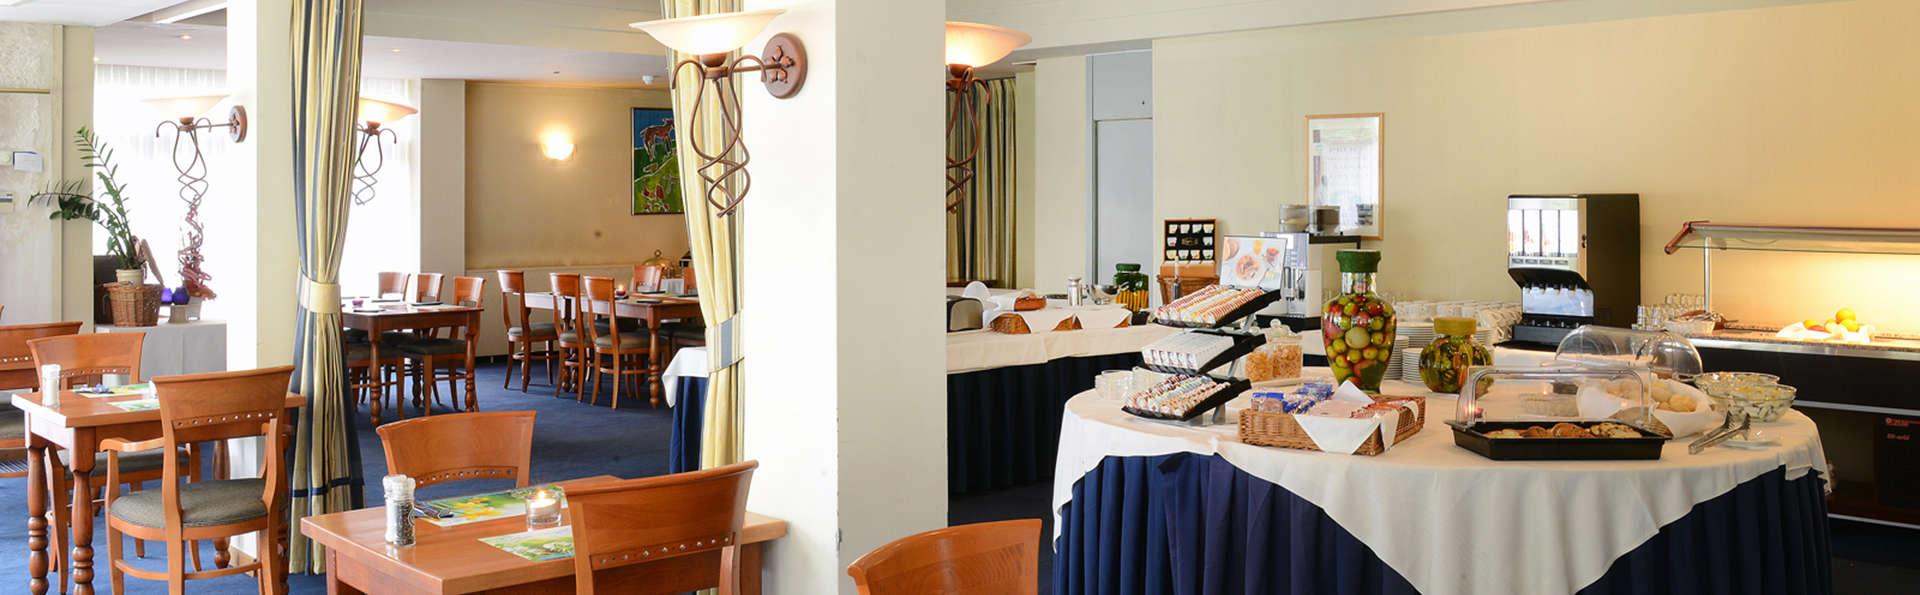 Amrâth Hotel Thermen Born- Sittard - edit_breakfast1.jpg